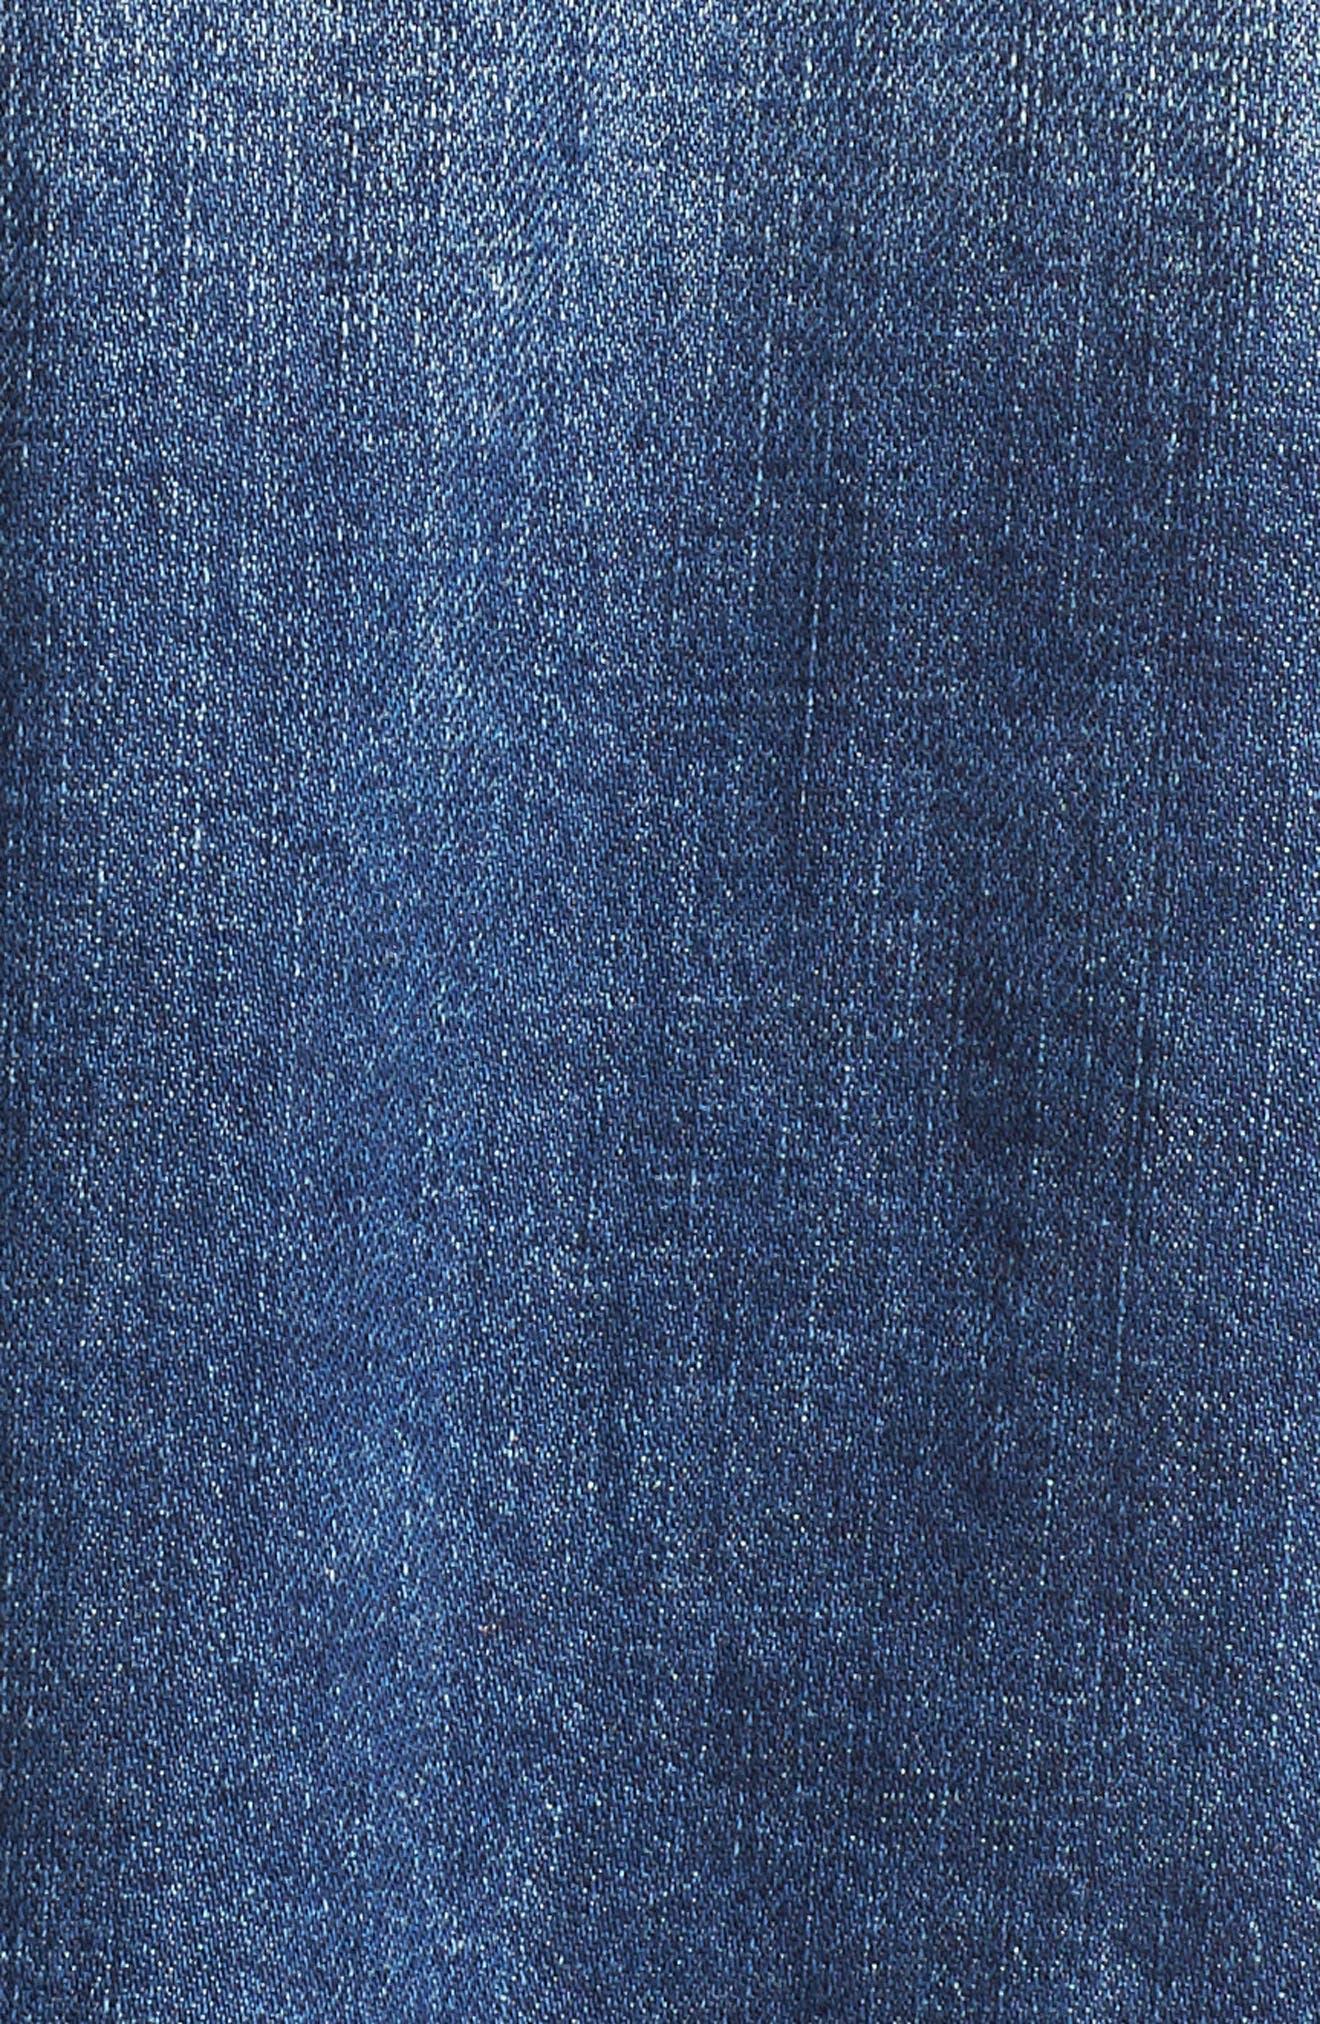 Oversize Colorblock Denim Jacket,                             Alternate thumbnail 6, color,                             Oakhurst